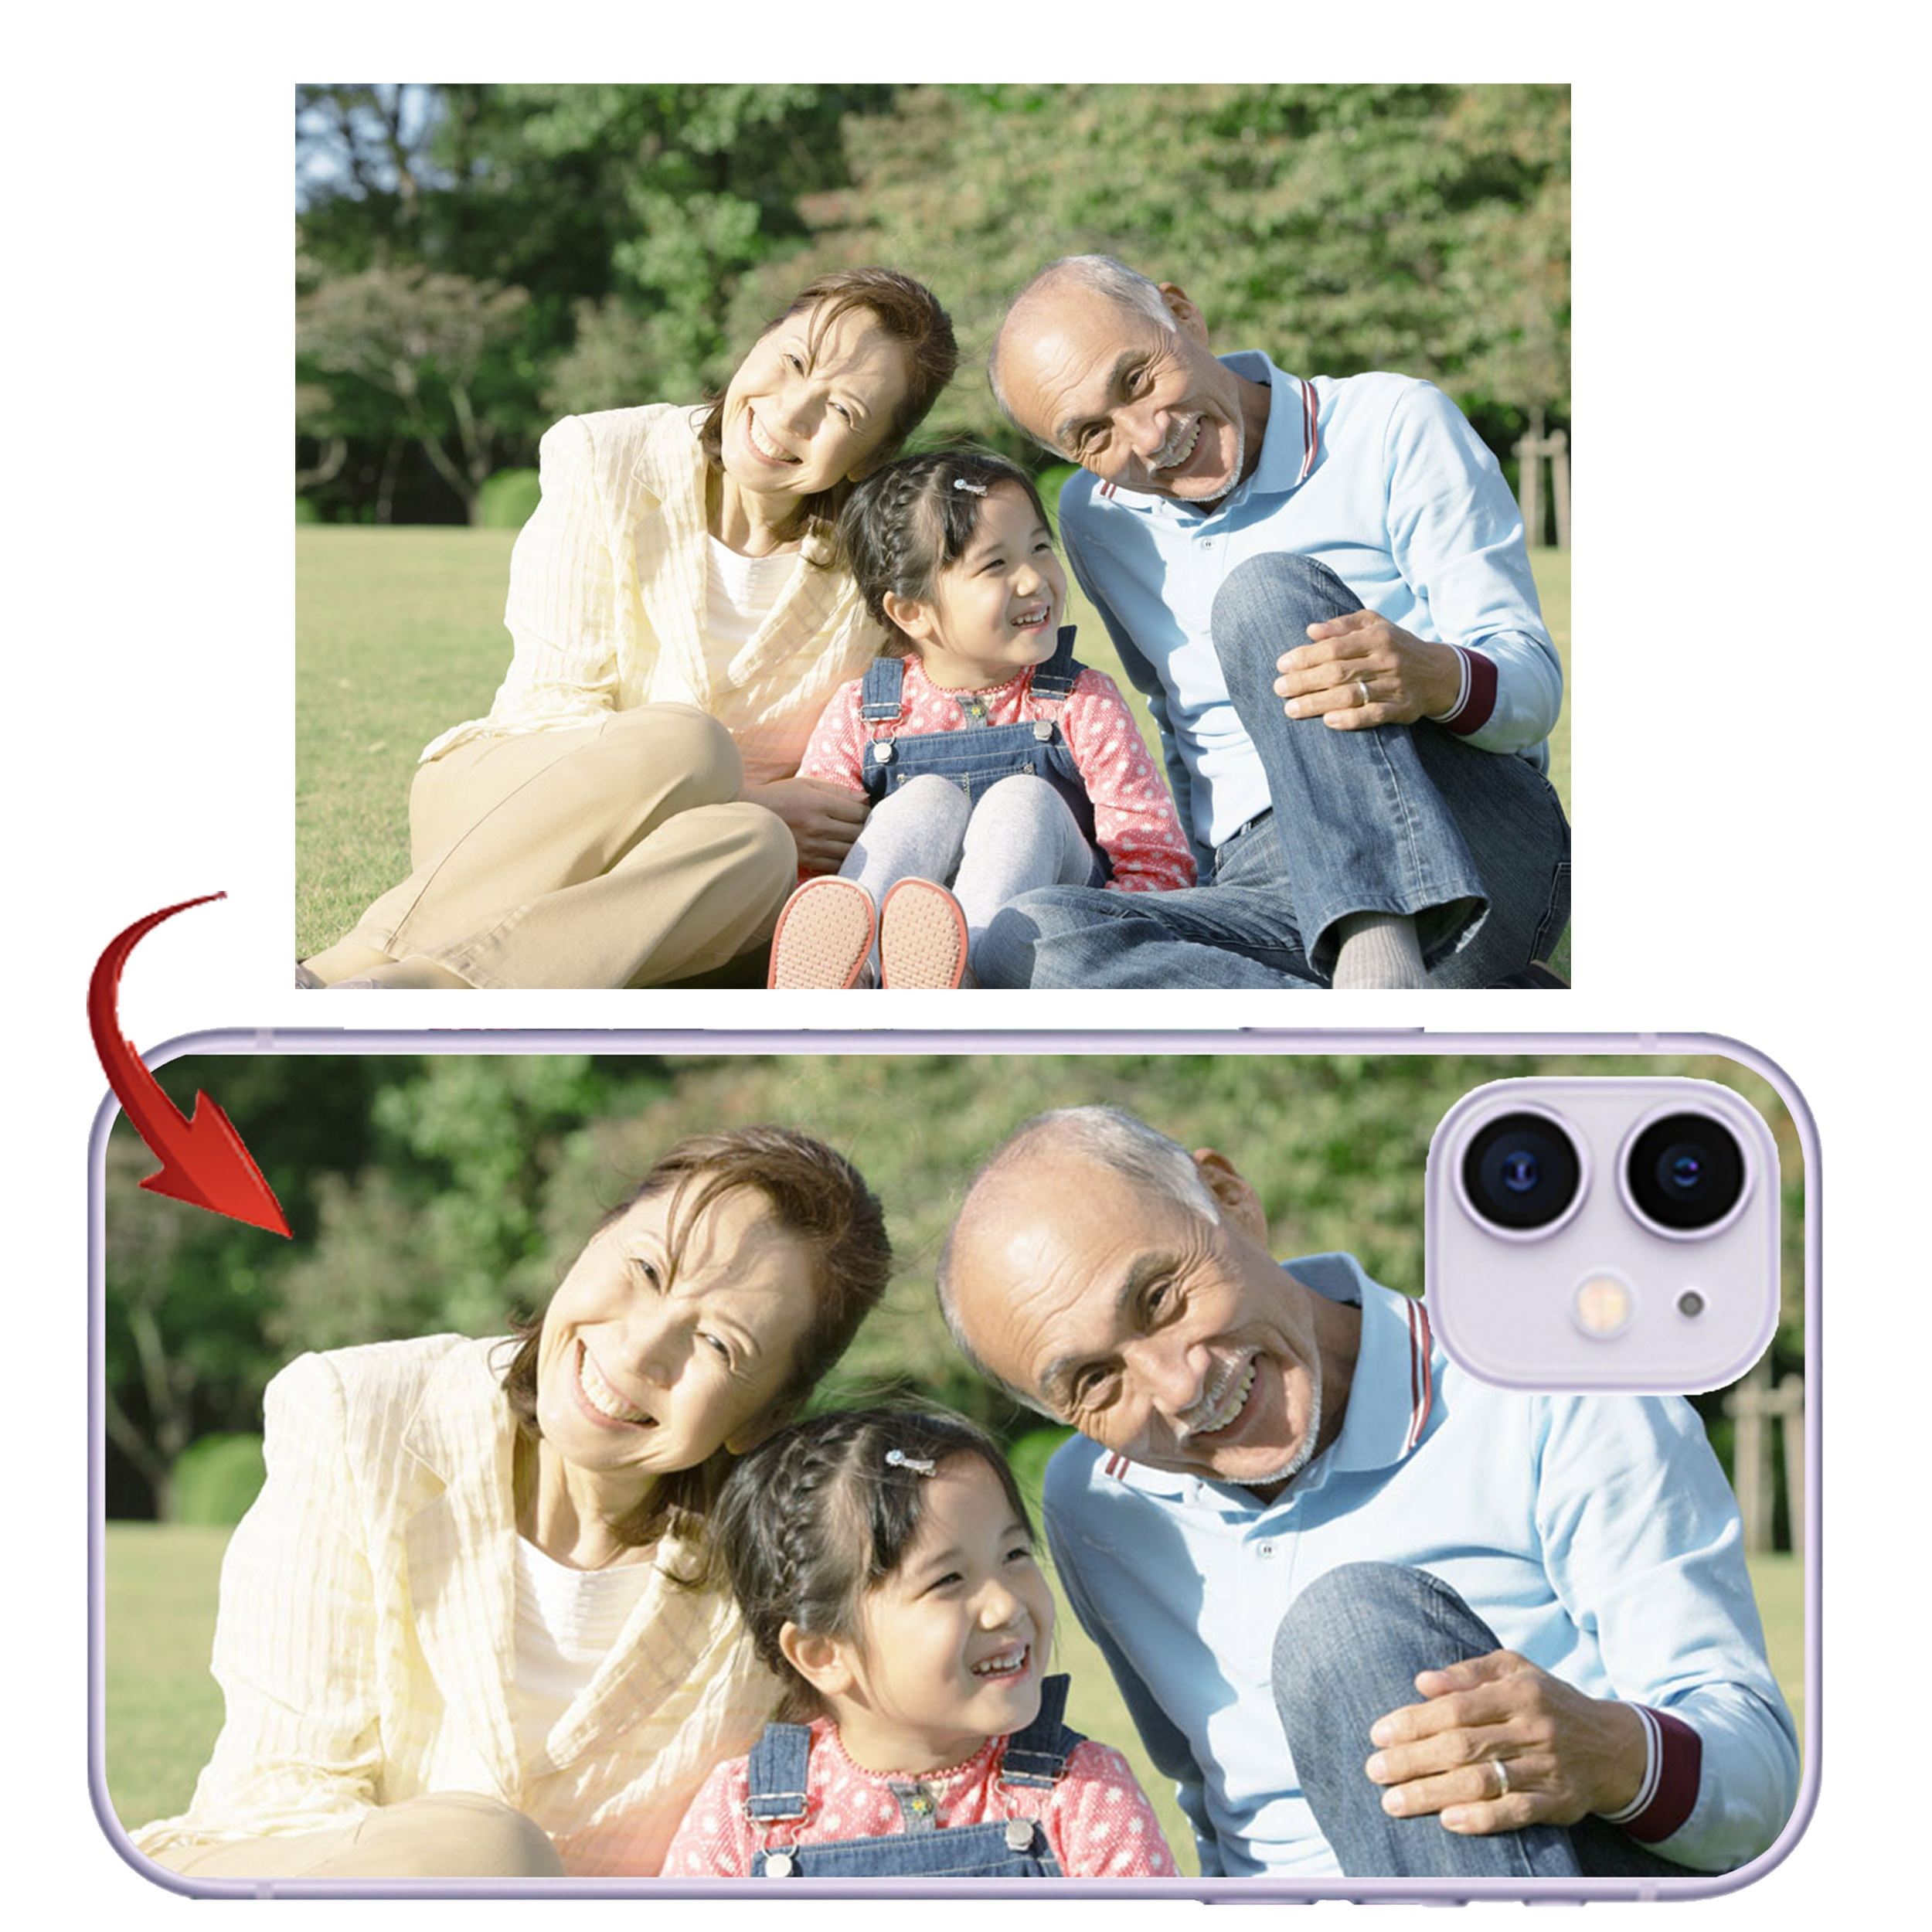 Carcasa de teléfono móvil con logotipo personalizado, carcasa de TPU suave para iphone 9, SE2, 11 pro max, XS, MAX, 7, 8, XR, X, 6s Plus, 6, 5s, se